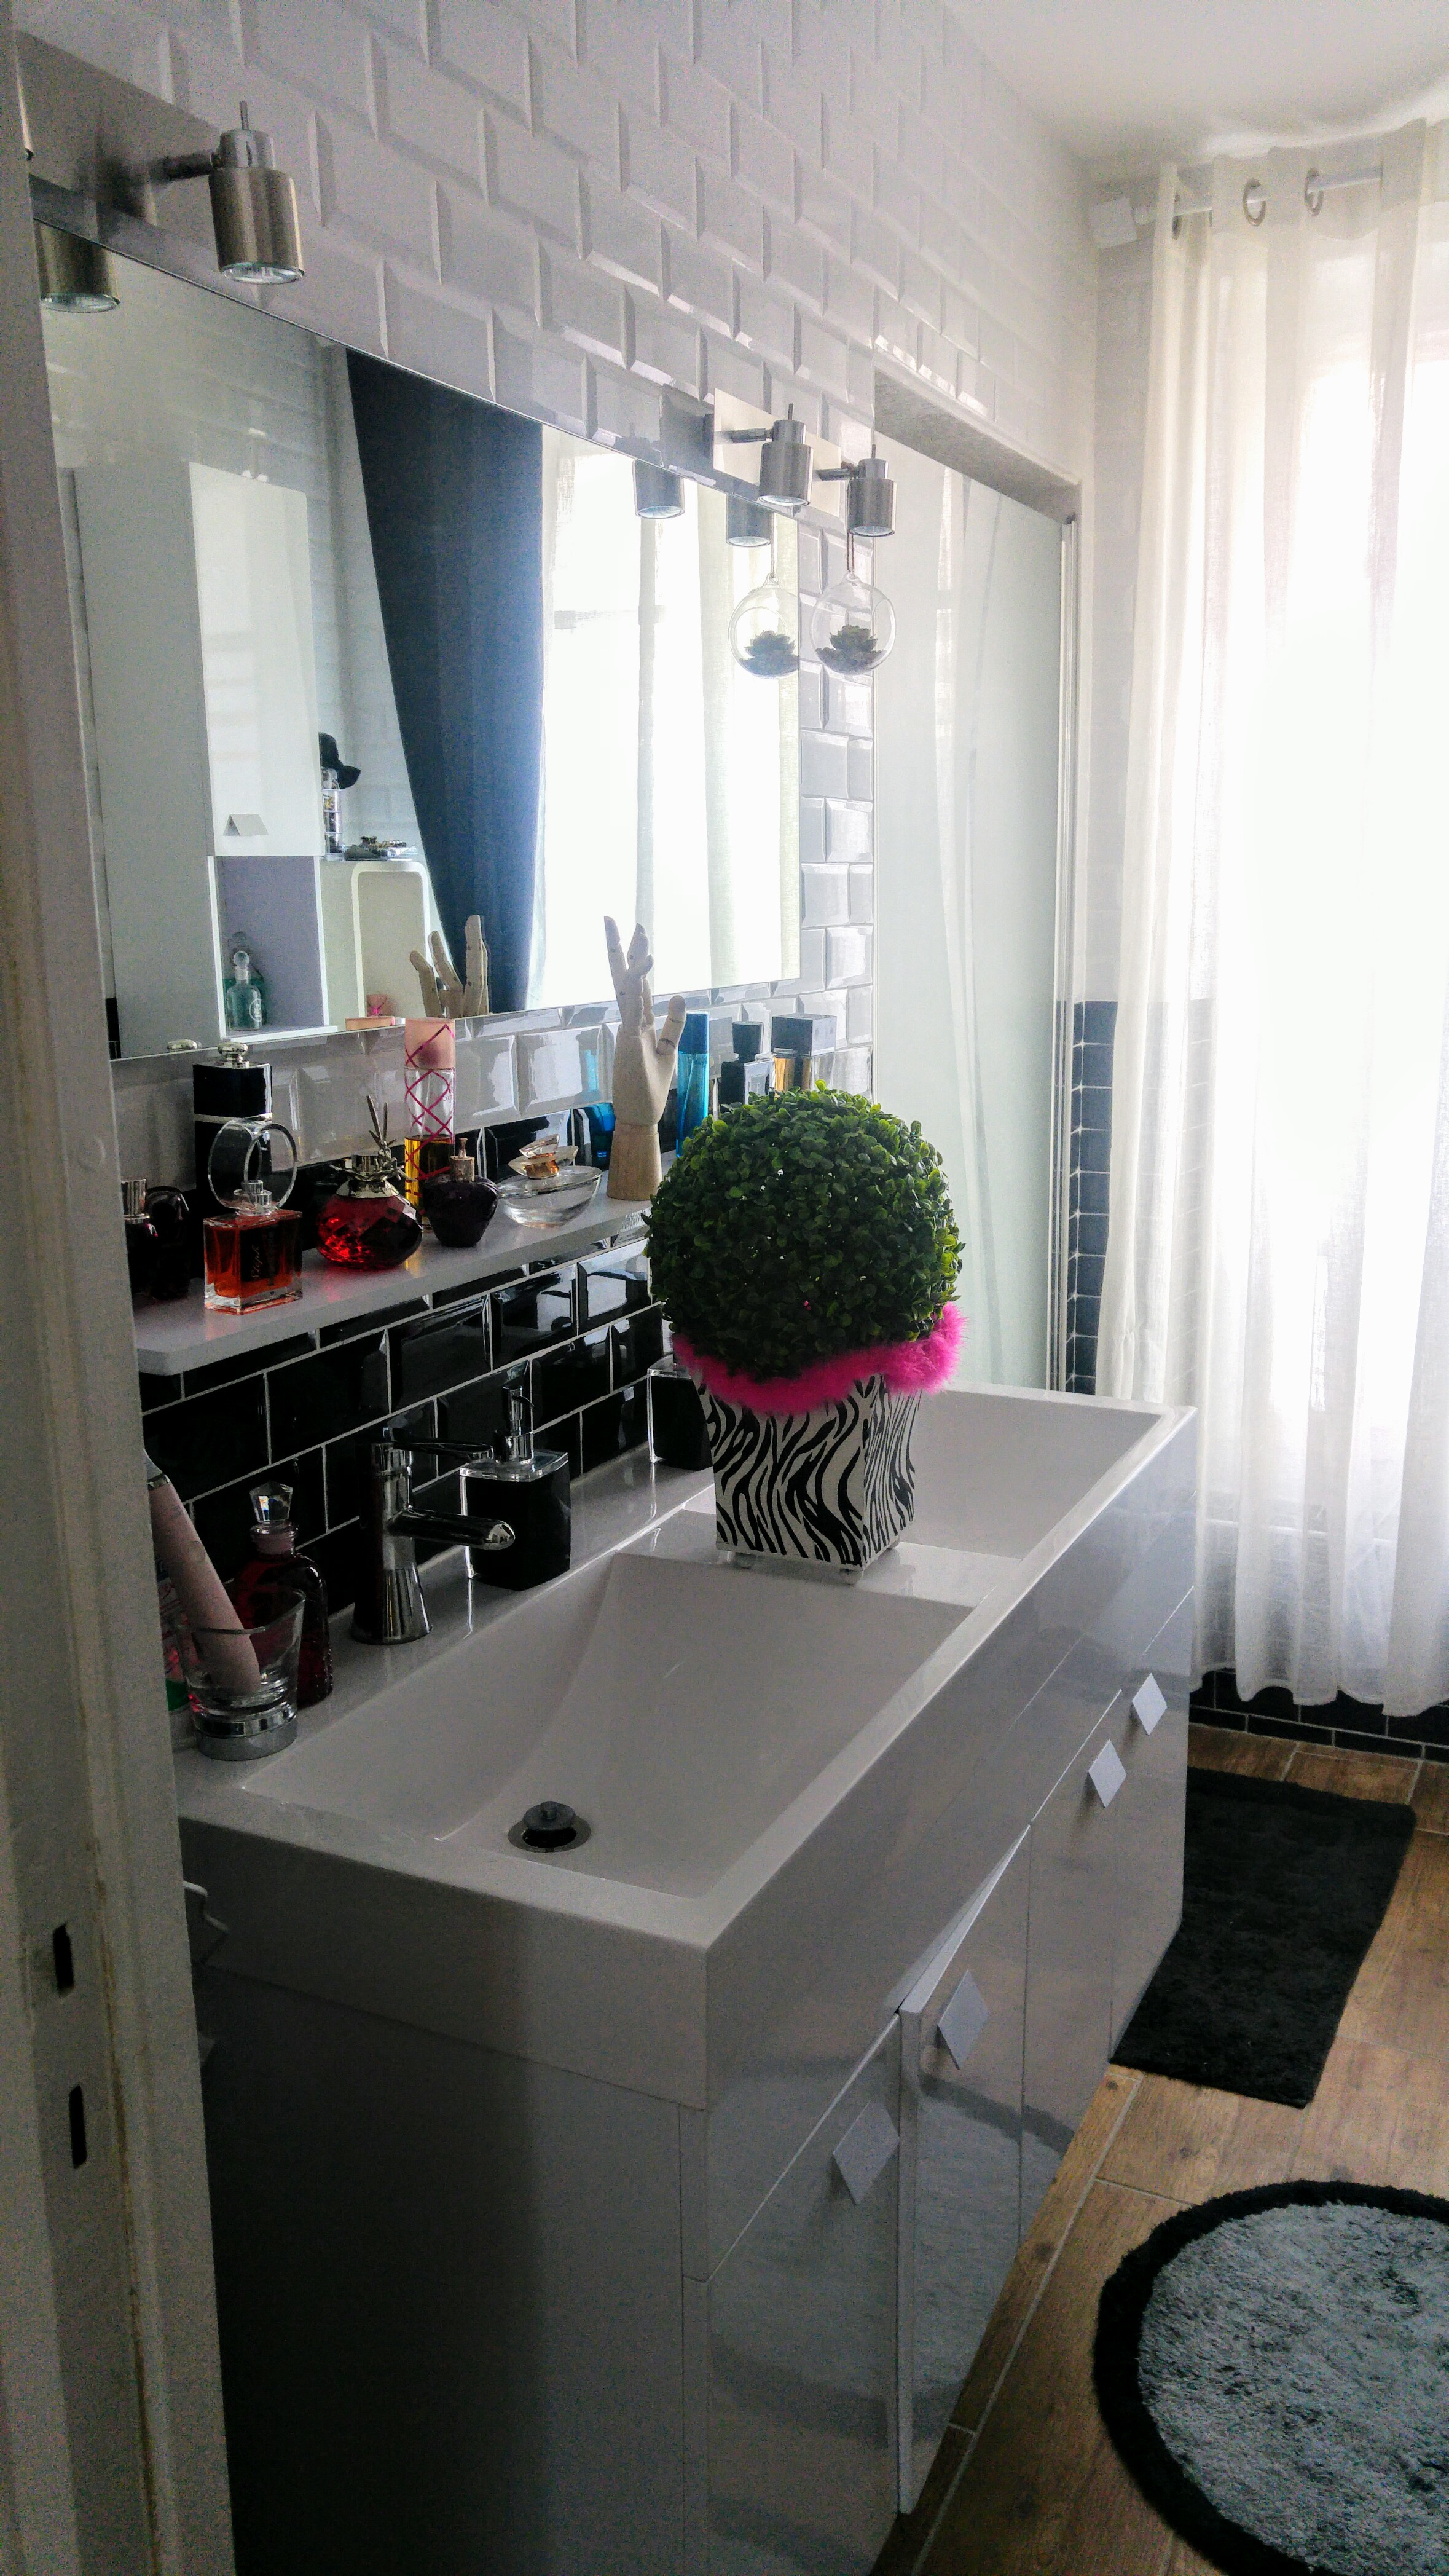 Avant apr s salle de bain design missglamazone - Carrelage metro noir et blanc ...